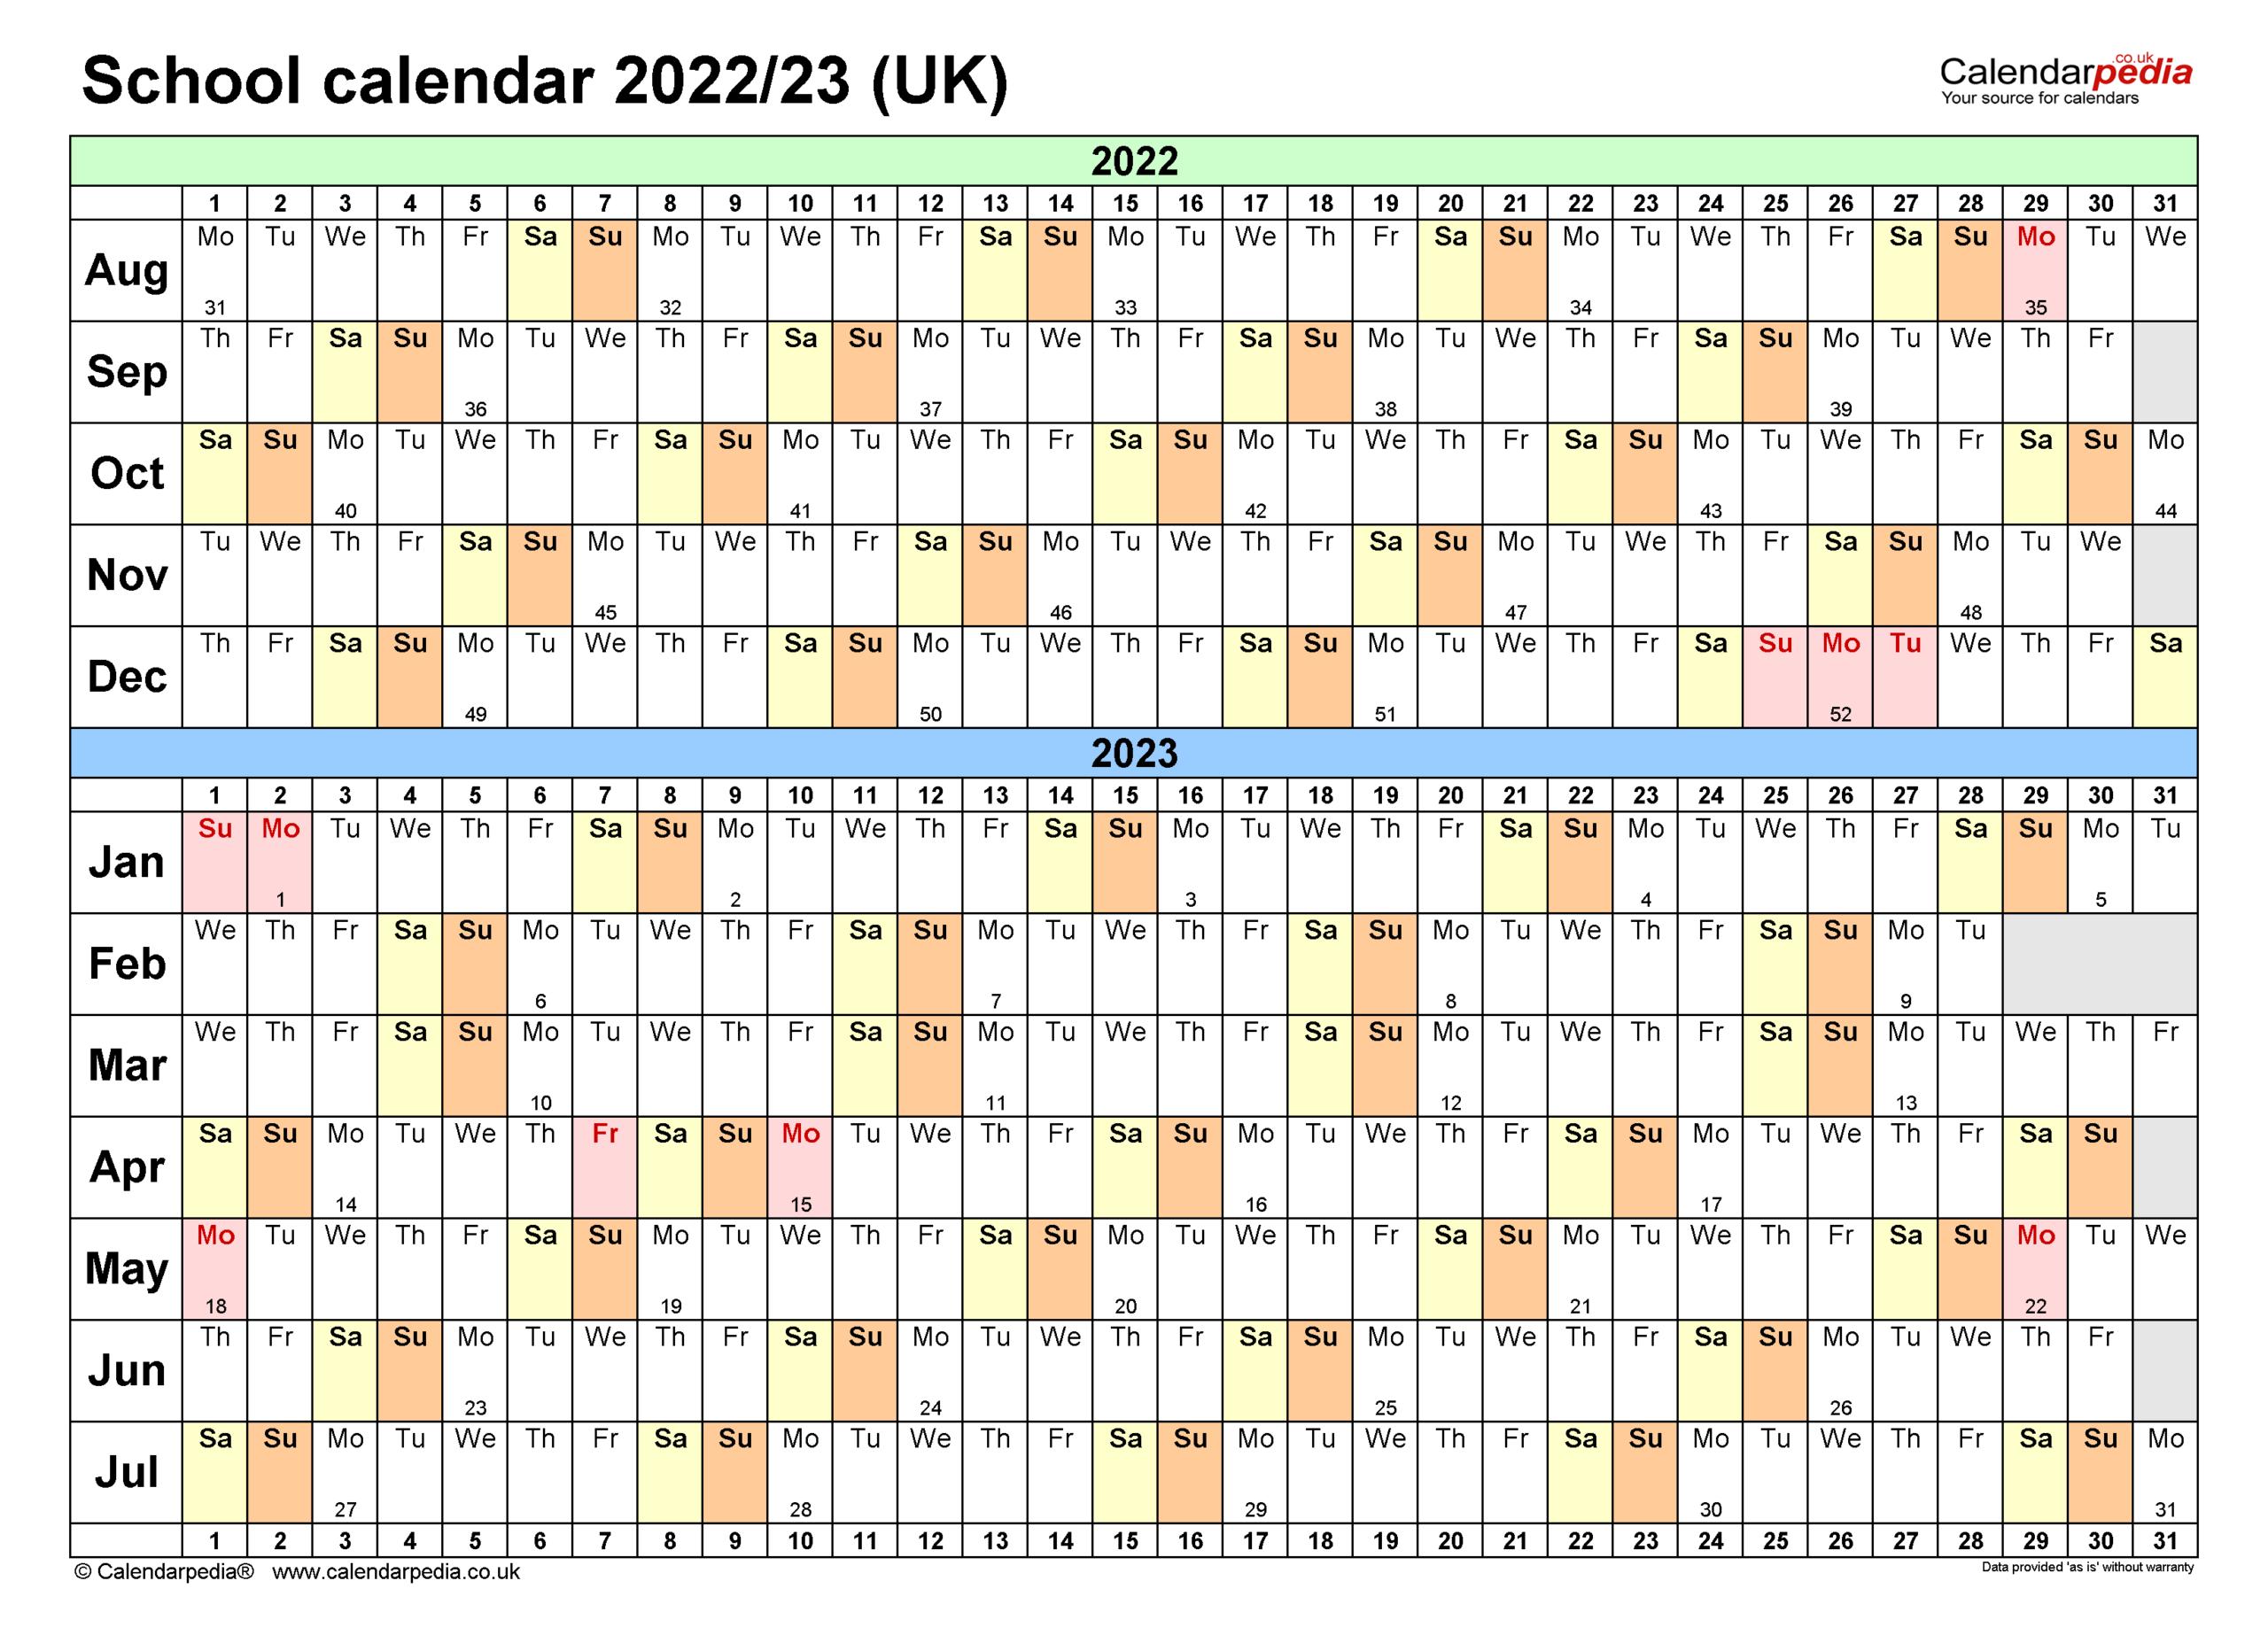 School Calendars 2022/2023 As Free Printable Word Templates for 2022 2023 School Calendar North Penn